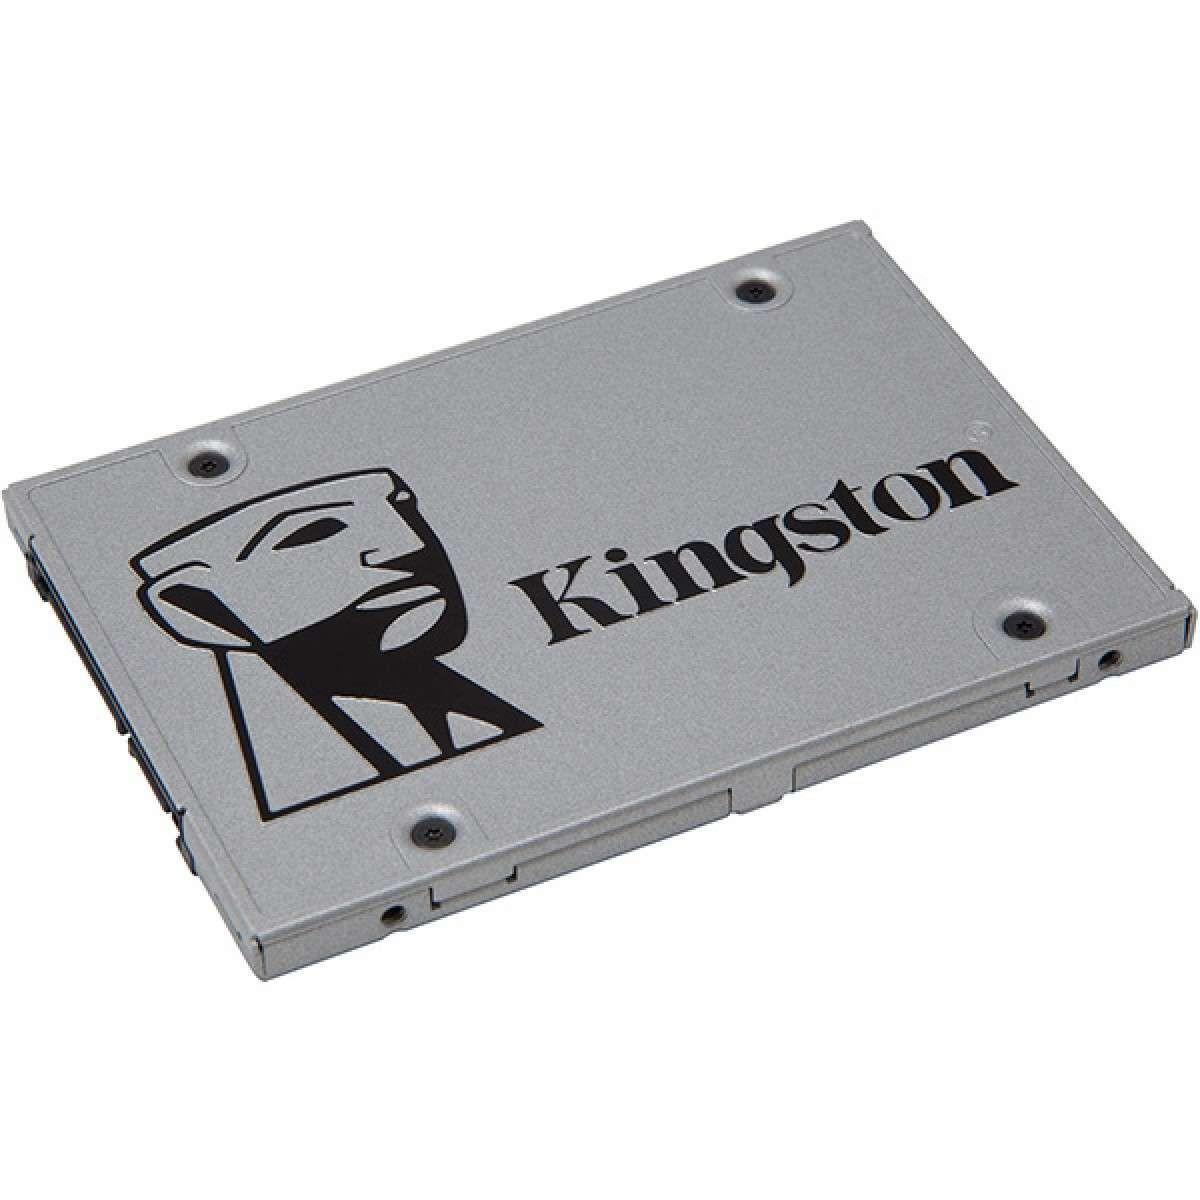 SSD 480GB Kingston Sata3 V400 2.5